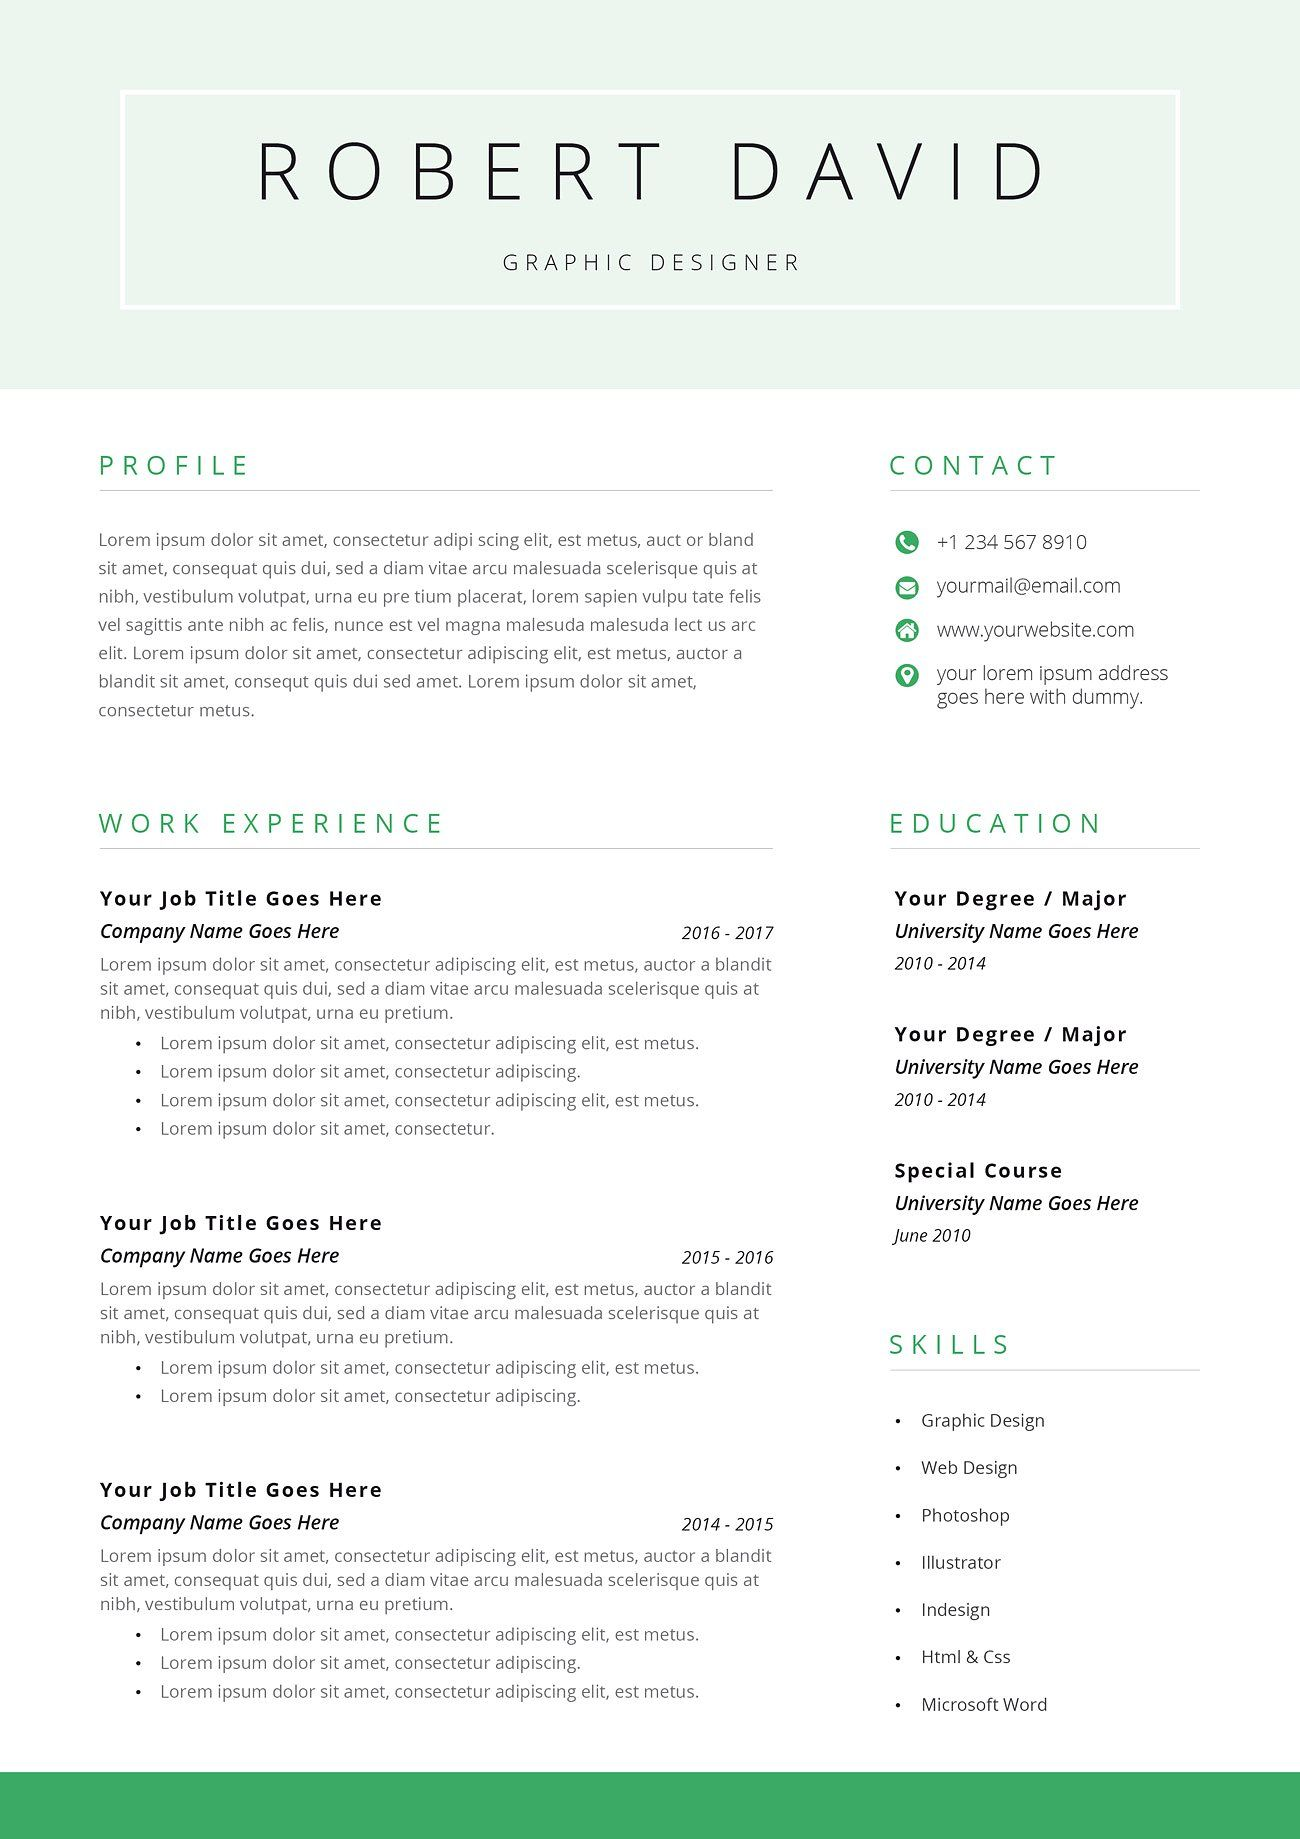 Resume Template / CV Templates, Resume template, Free